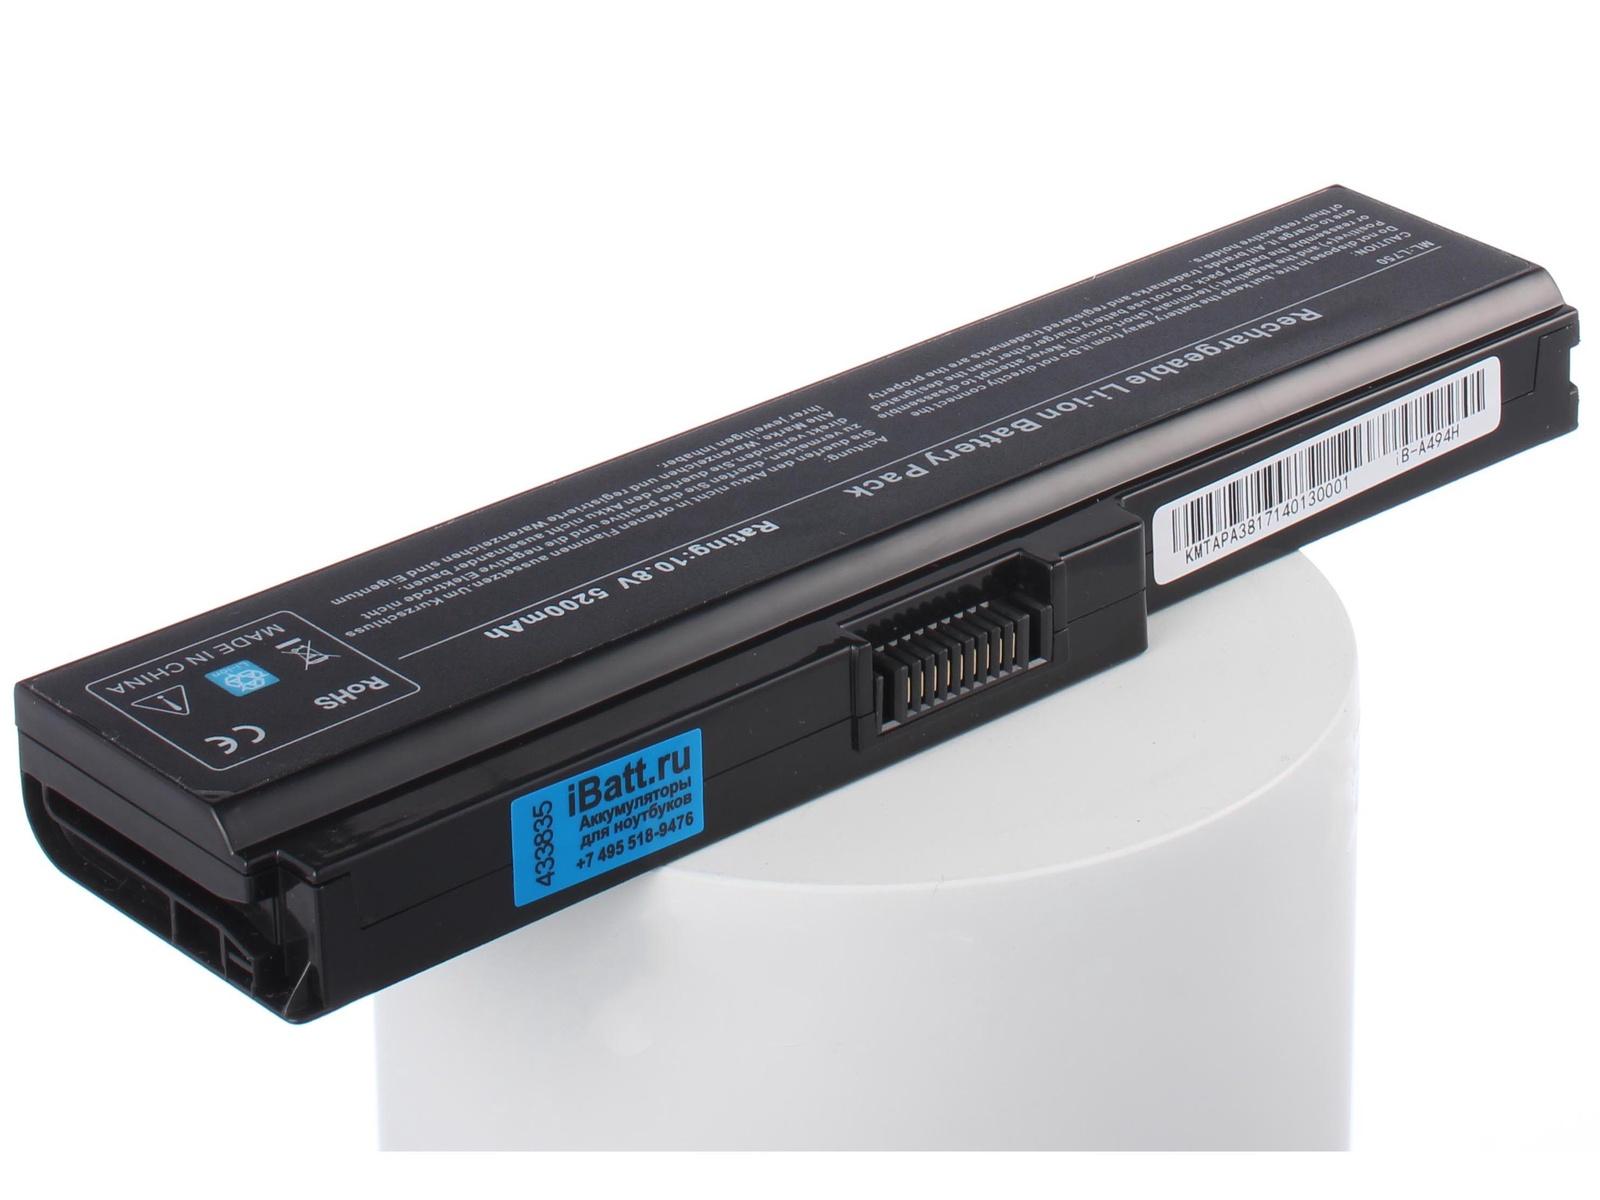 все цены на Аккумулятор для ноутбука iBatt для ToshiBa Satellite L655-1EK, Satellite L655D, Satellite A665-S6050, Satellite L650D-100, Satellite A660-181, Satellite L650D-137, Satellite L630-140, Satellite L645, Satellite L635-12R онлайн